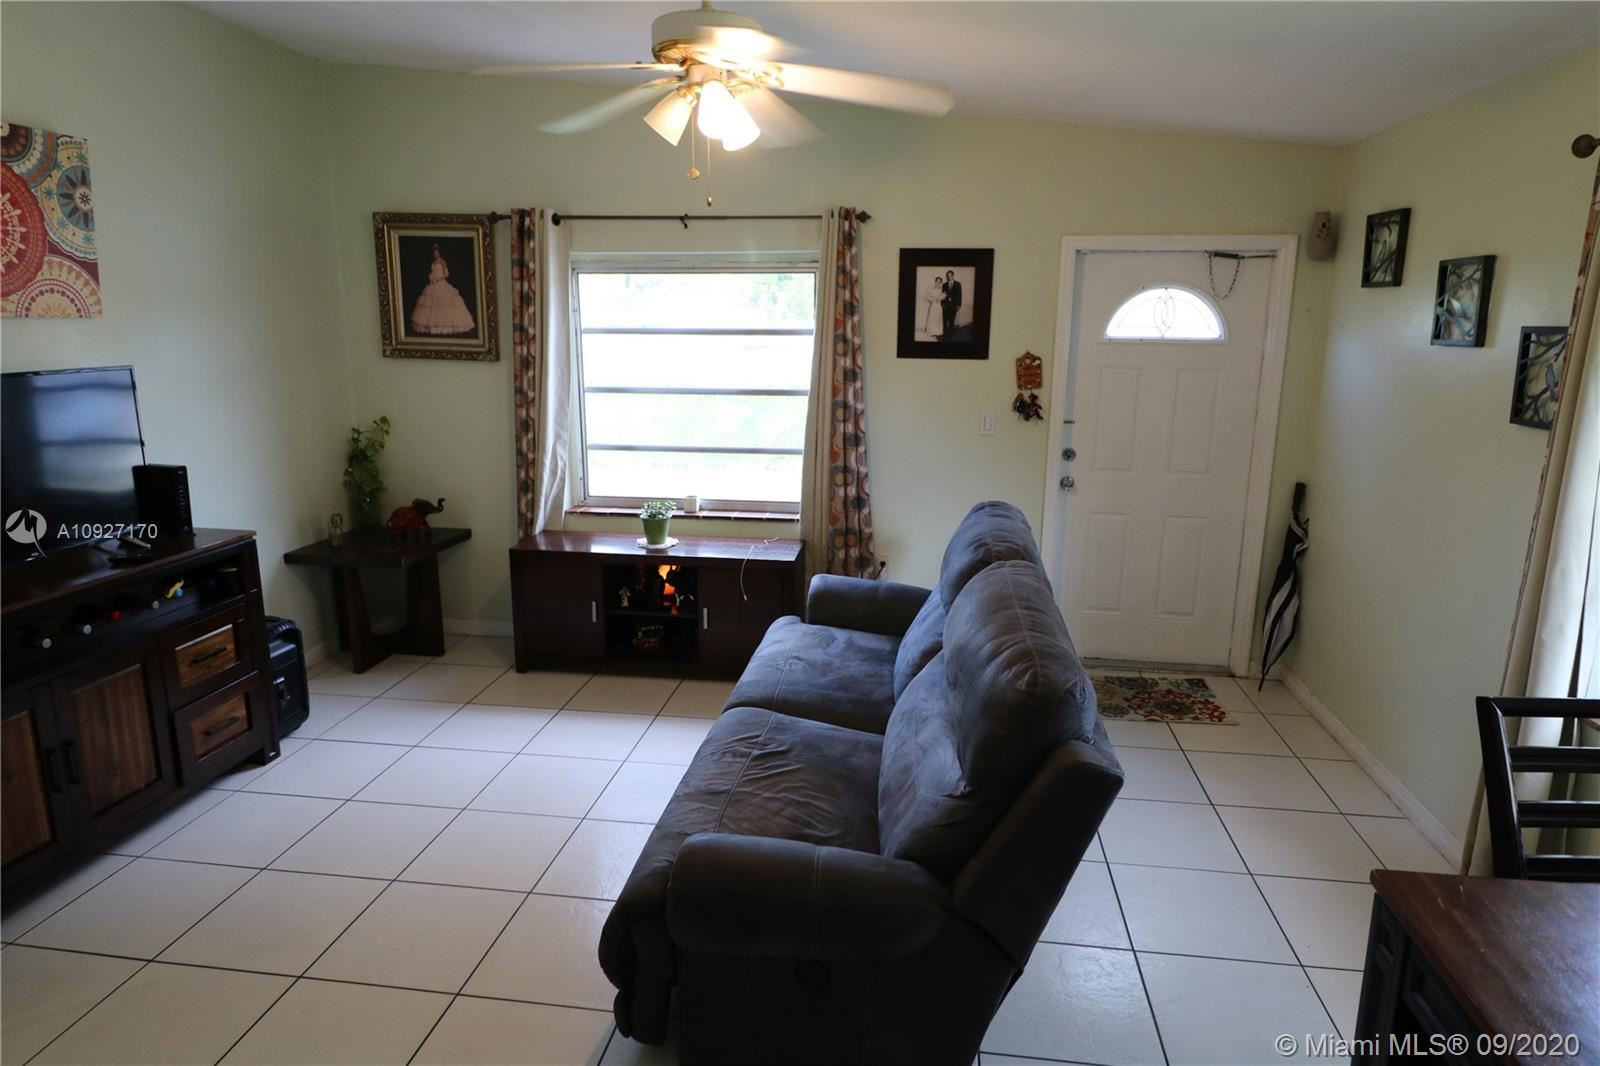 Photo of 13705 NW 3 CT, North Miami, FL 33168 (MLS # A10927170)